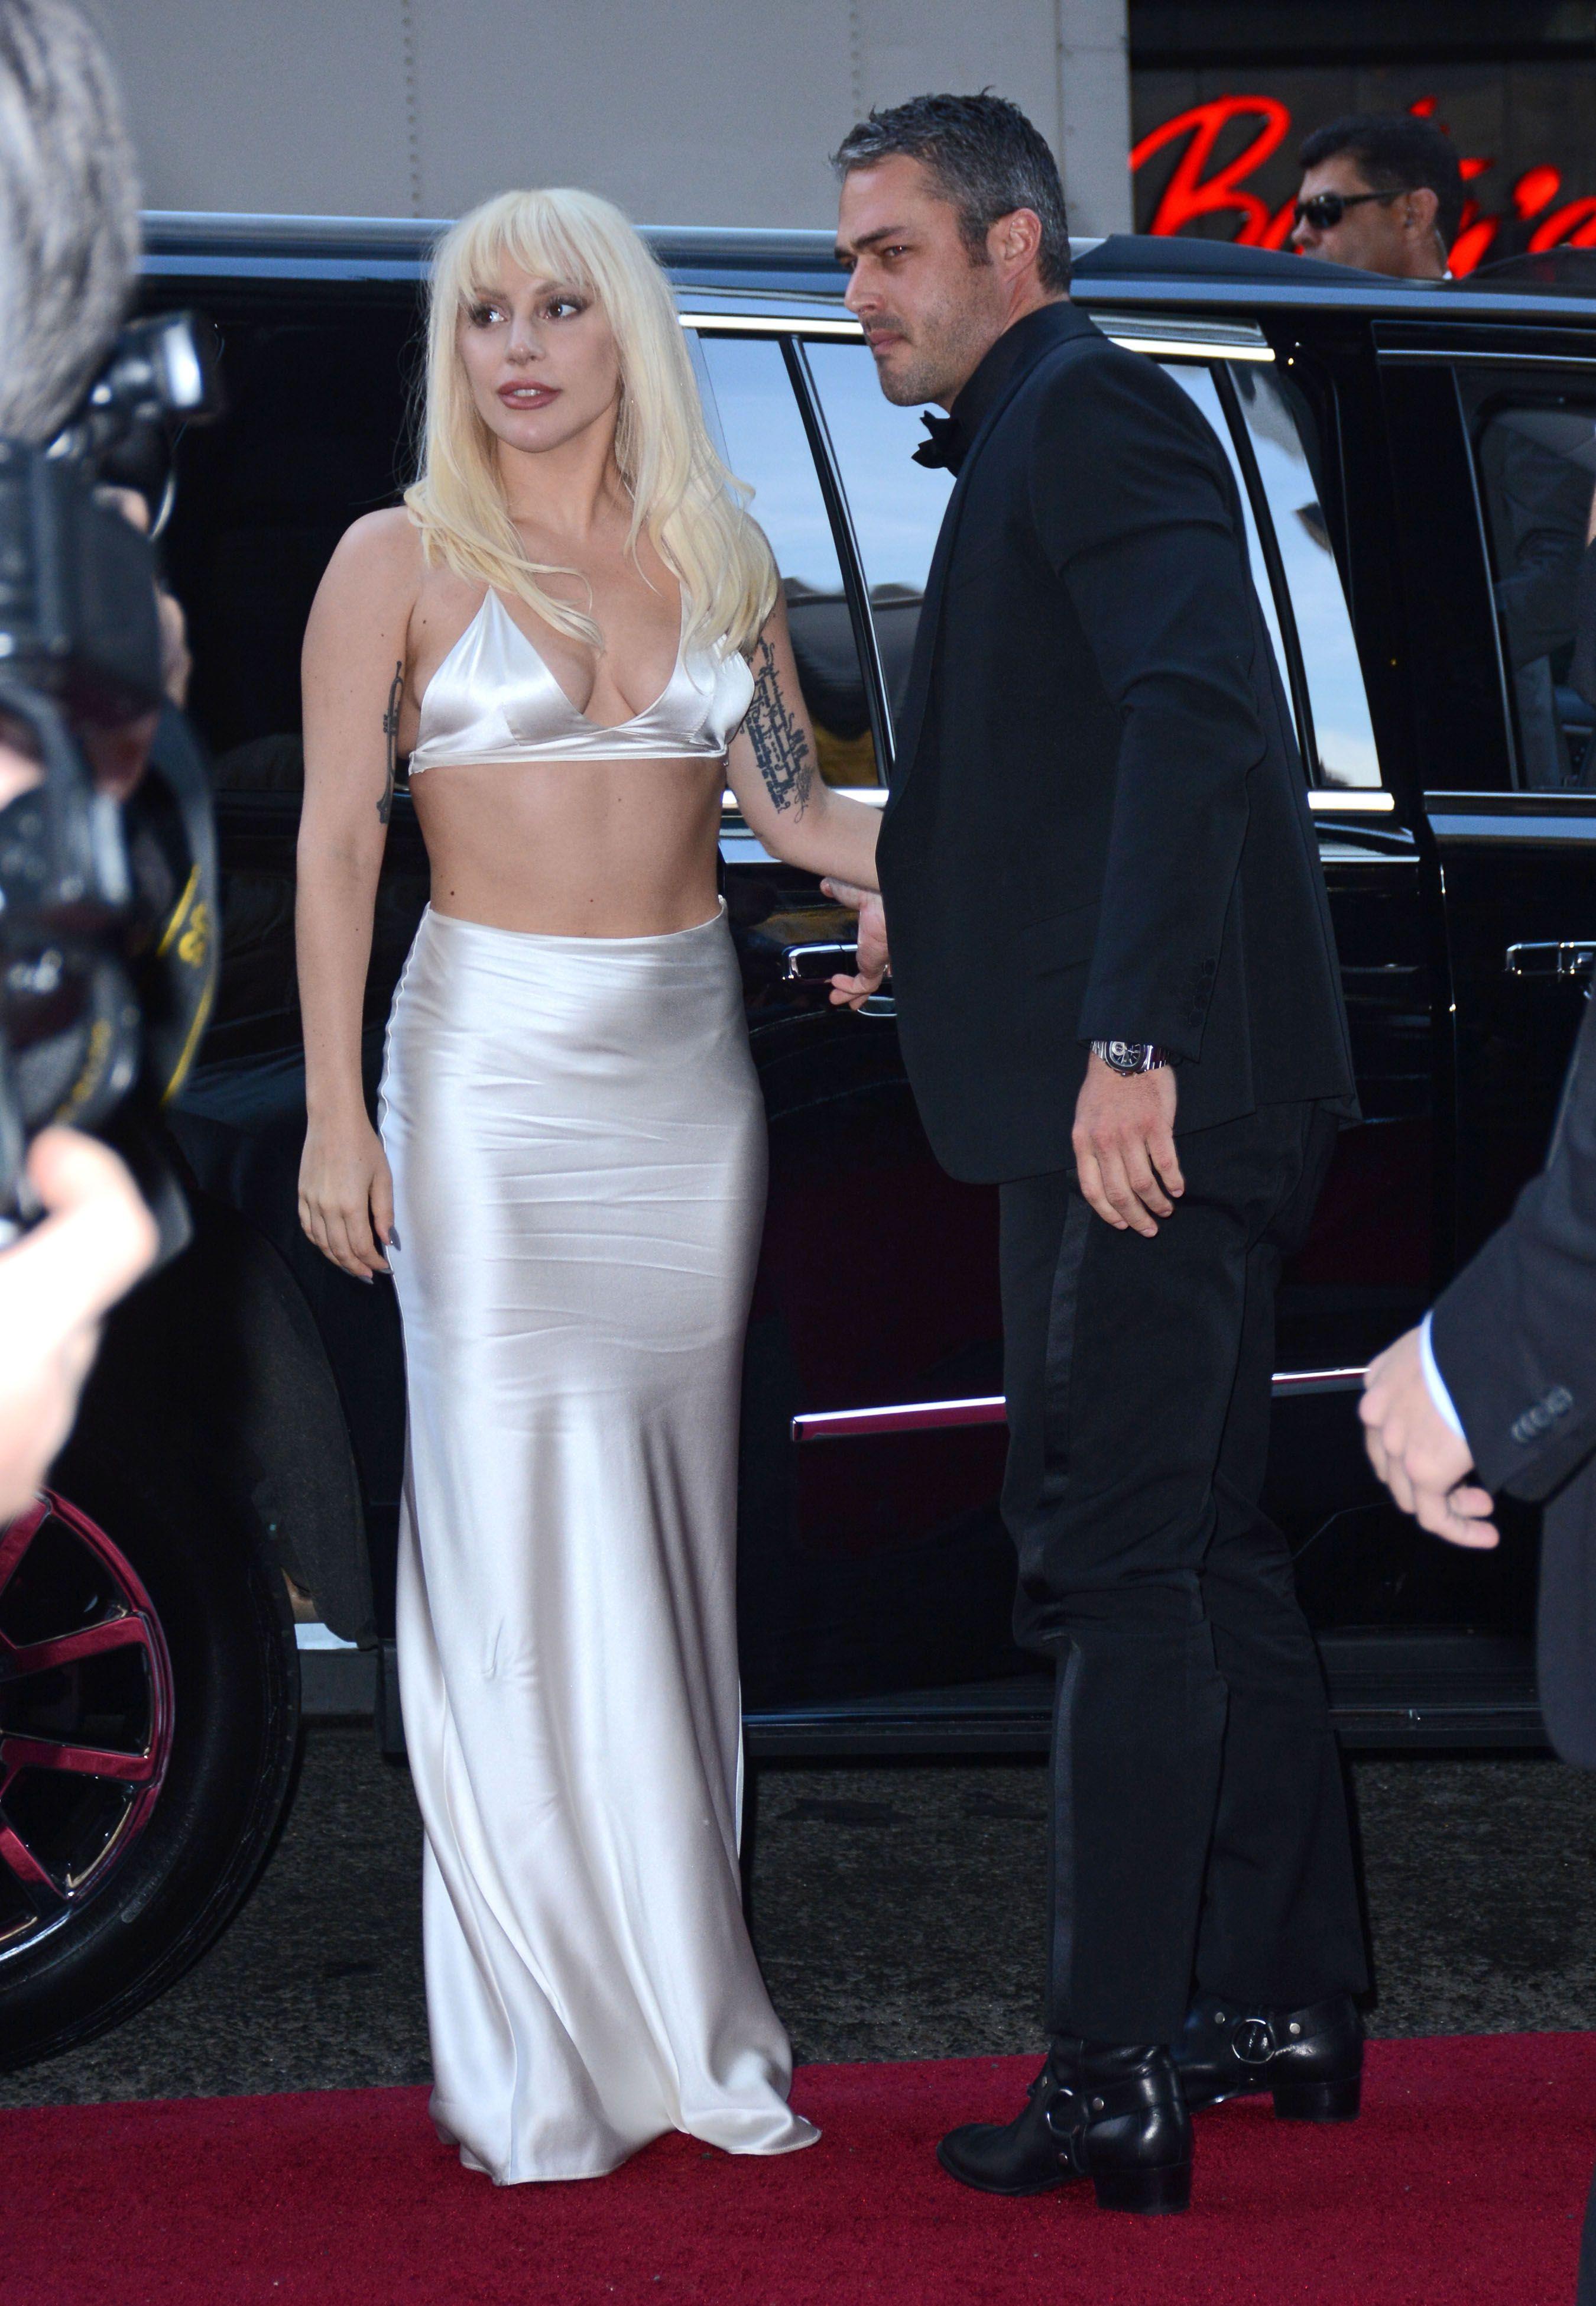 Lady-Gaga-Cleavage-21